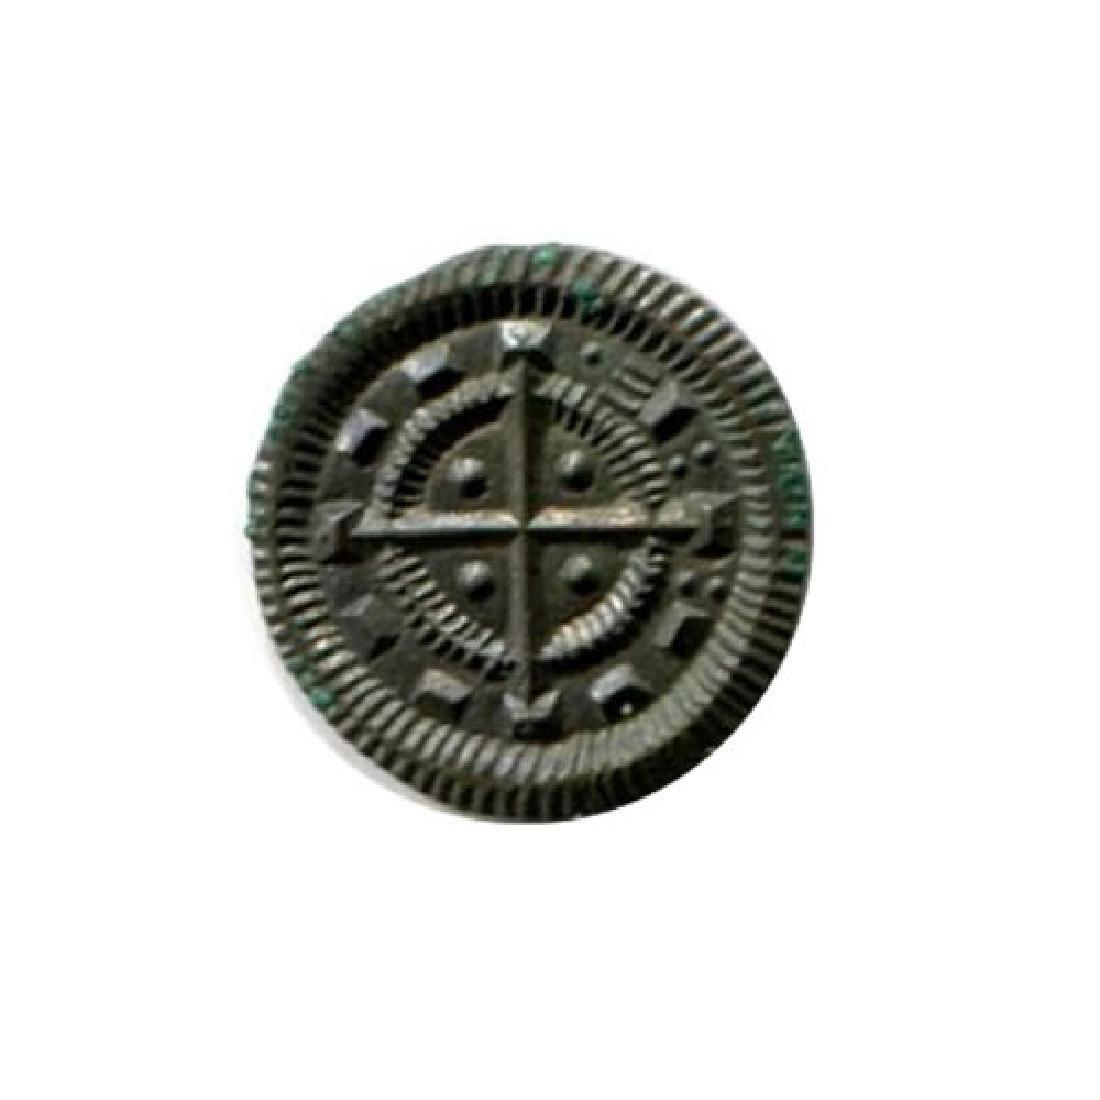 Hungary silver denar Bela II A.D. 1131-1141 Huszar#102